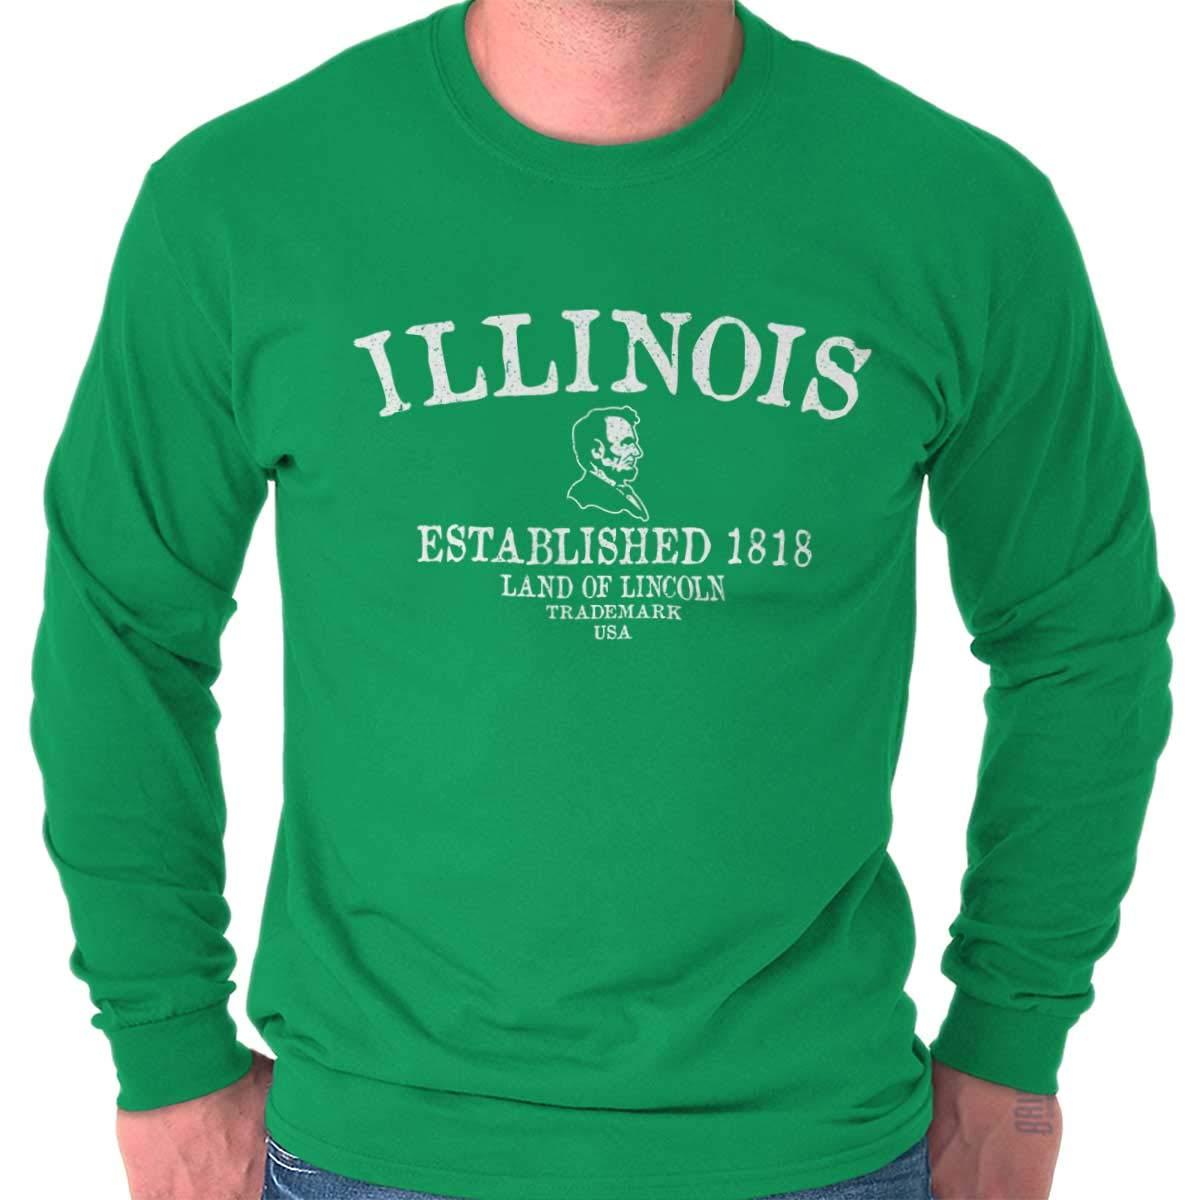 a96422d74 Classic Teaze Illinois State - Trademark Printed Long Sleeve T Shirt - Irish  Green